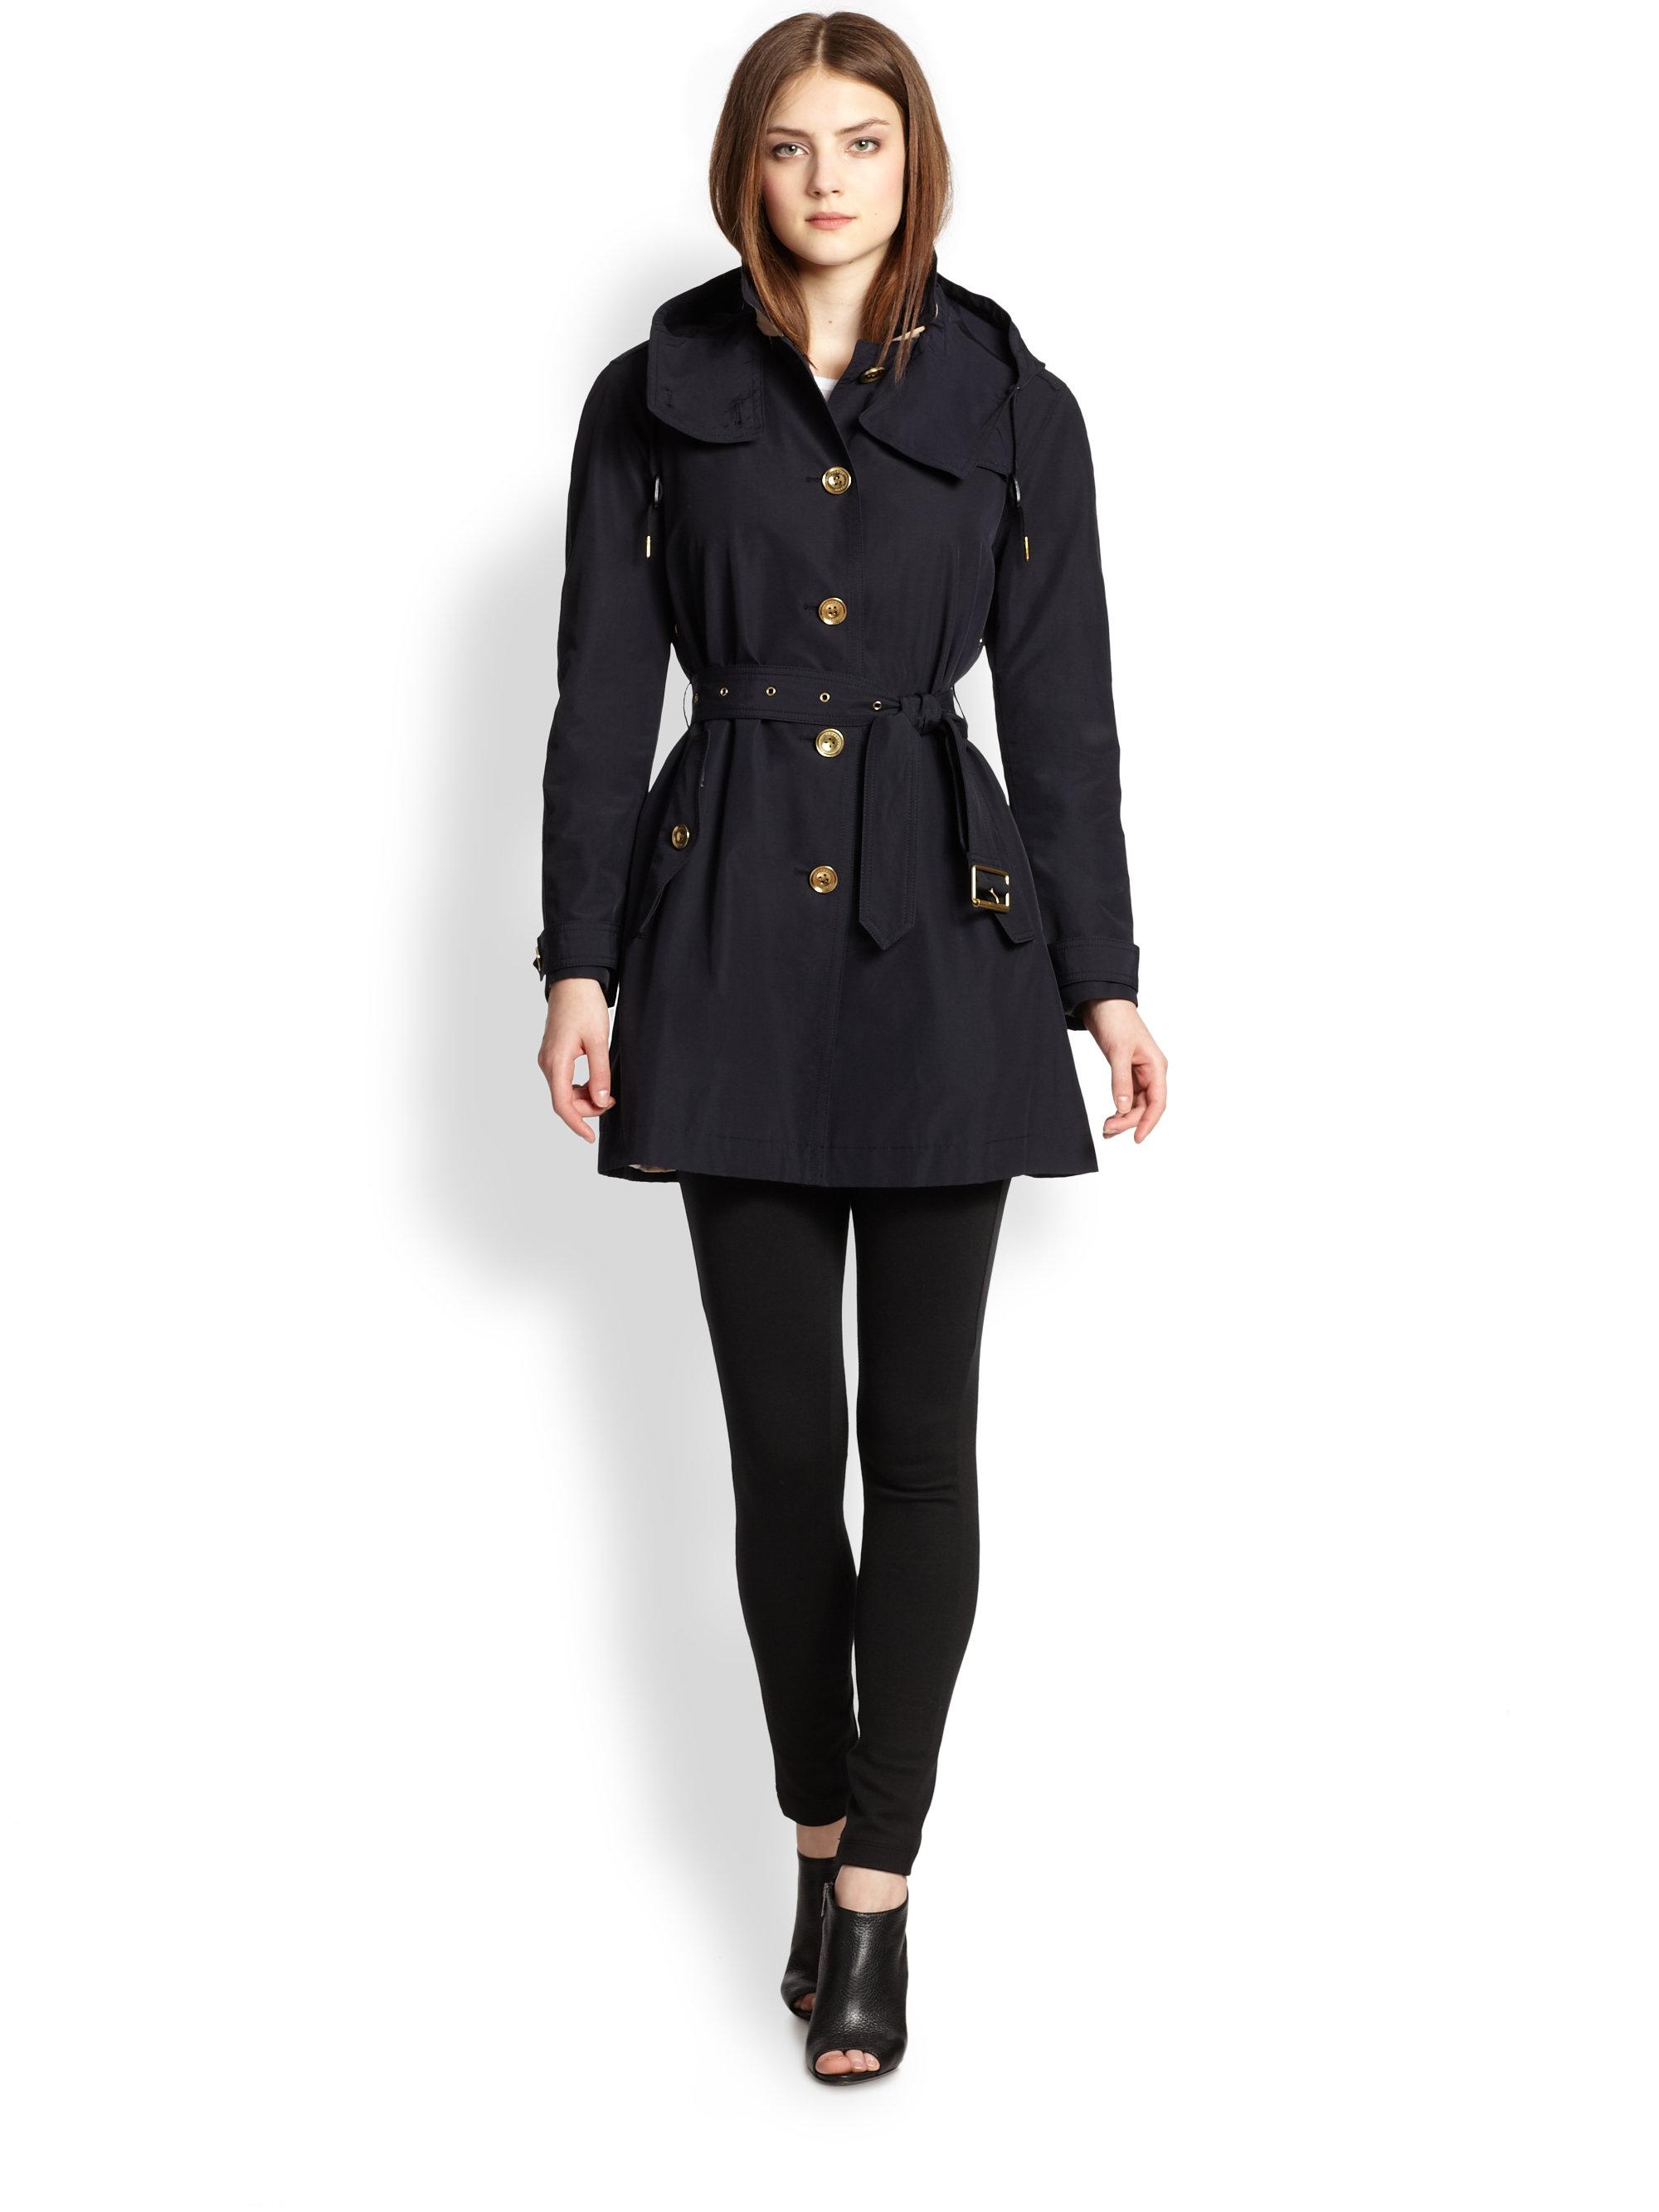 Lyst - Burberry brit L... Ivanka Trump Clothing